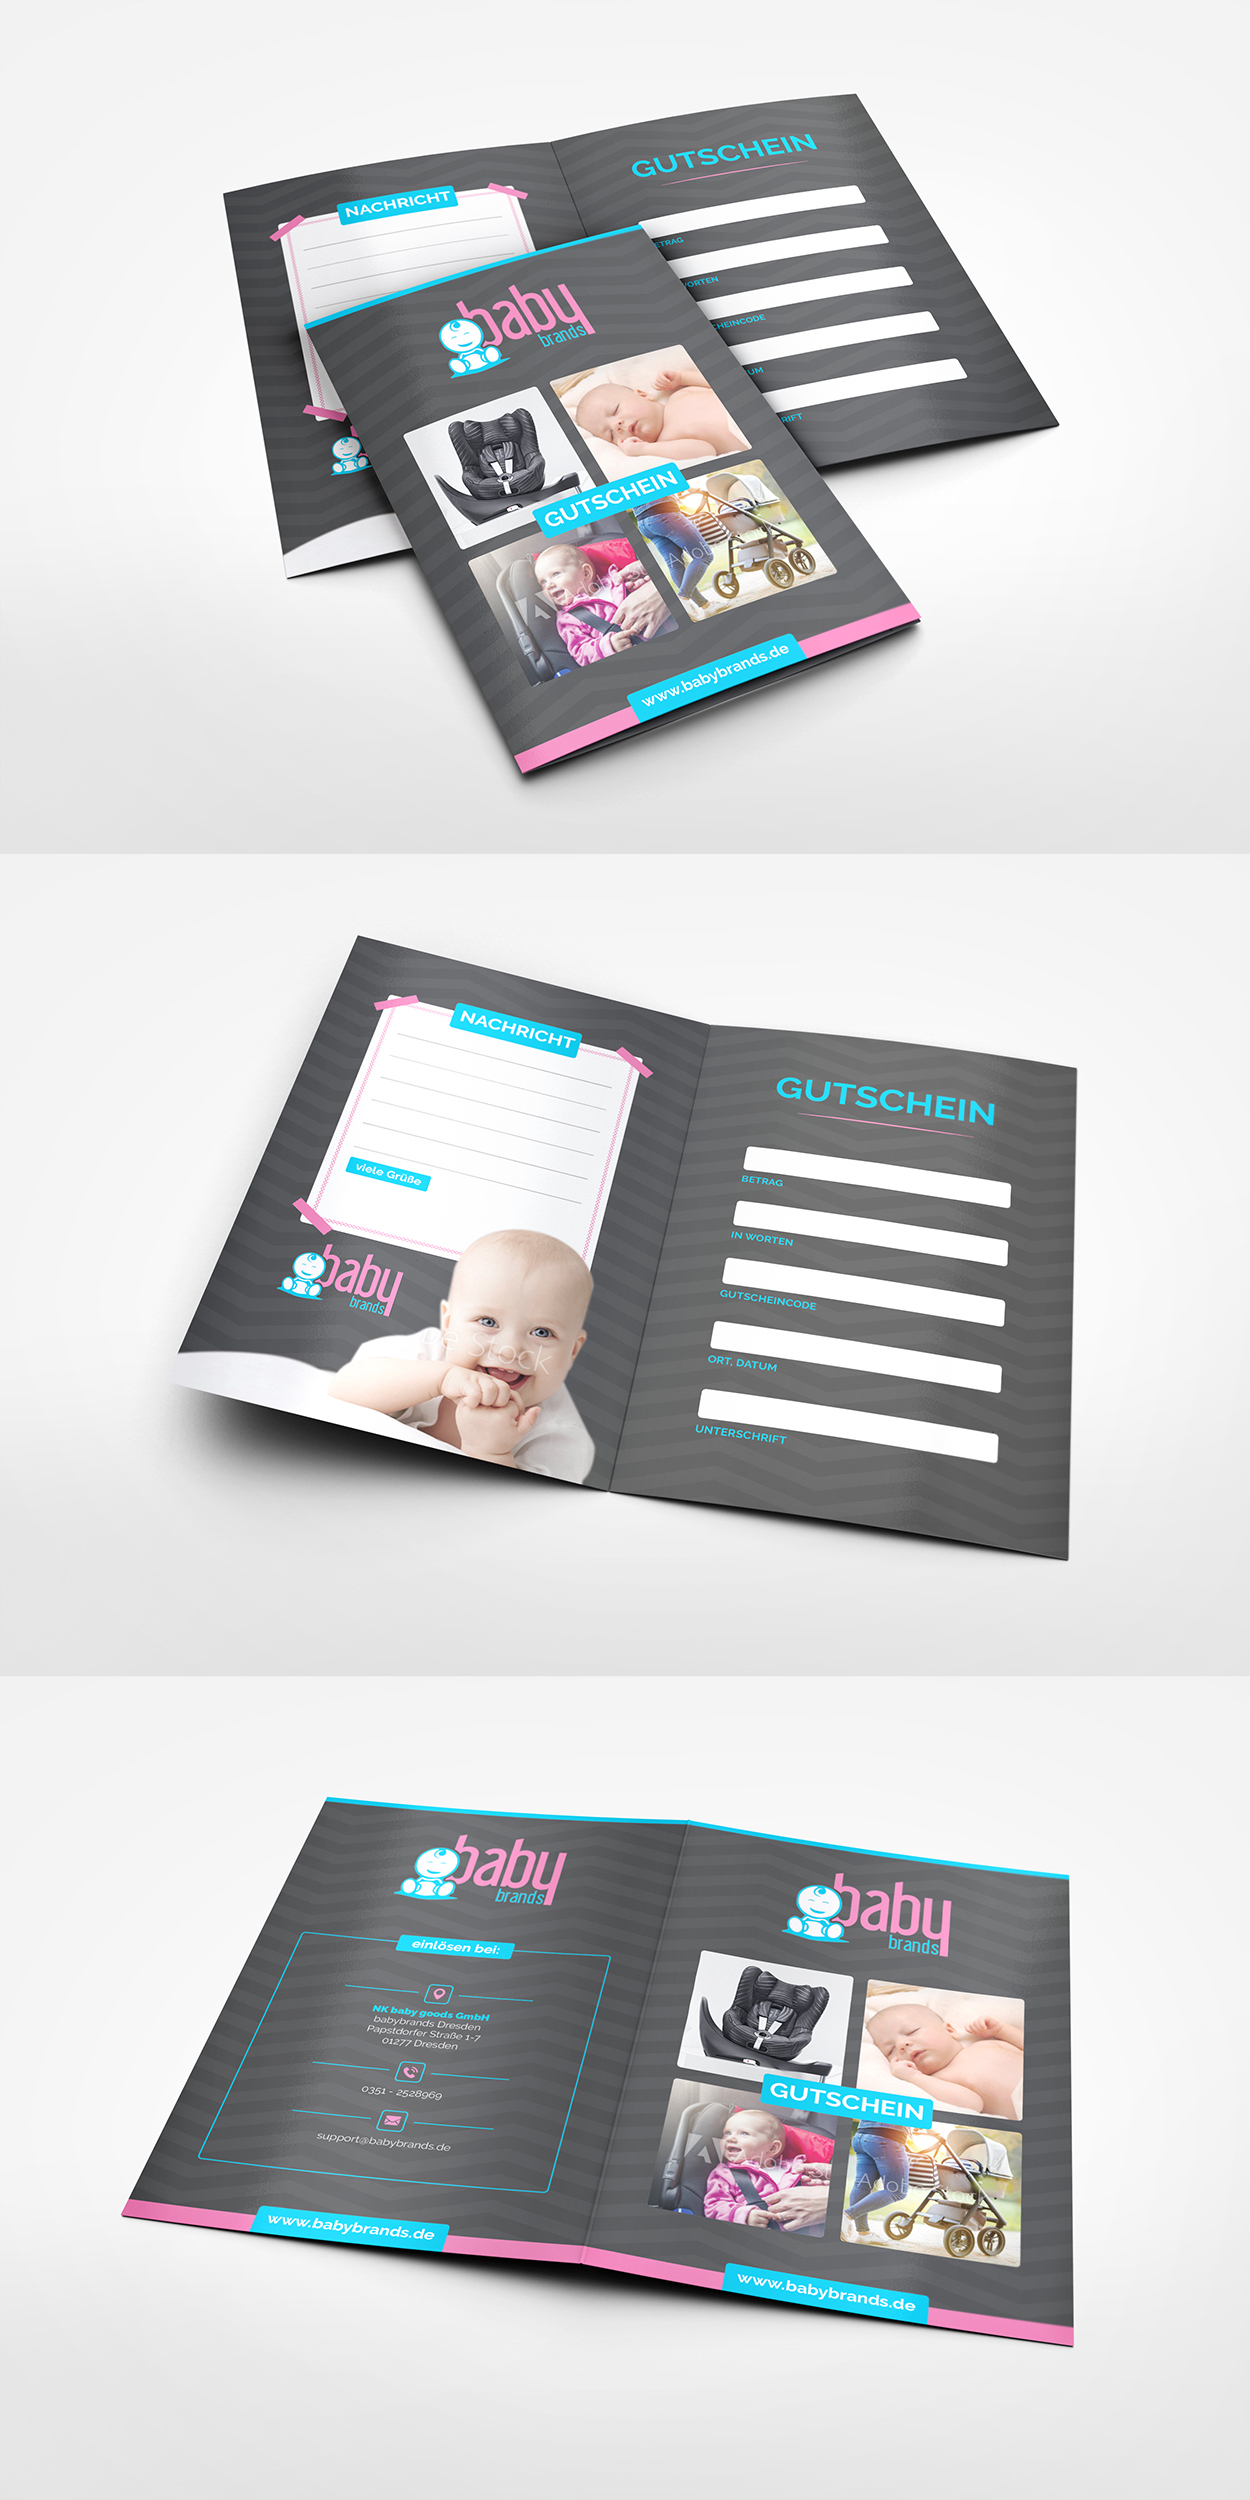 design #11 of MaDesigns